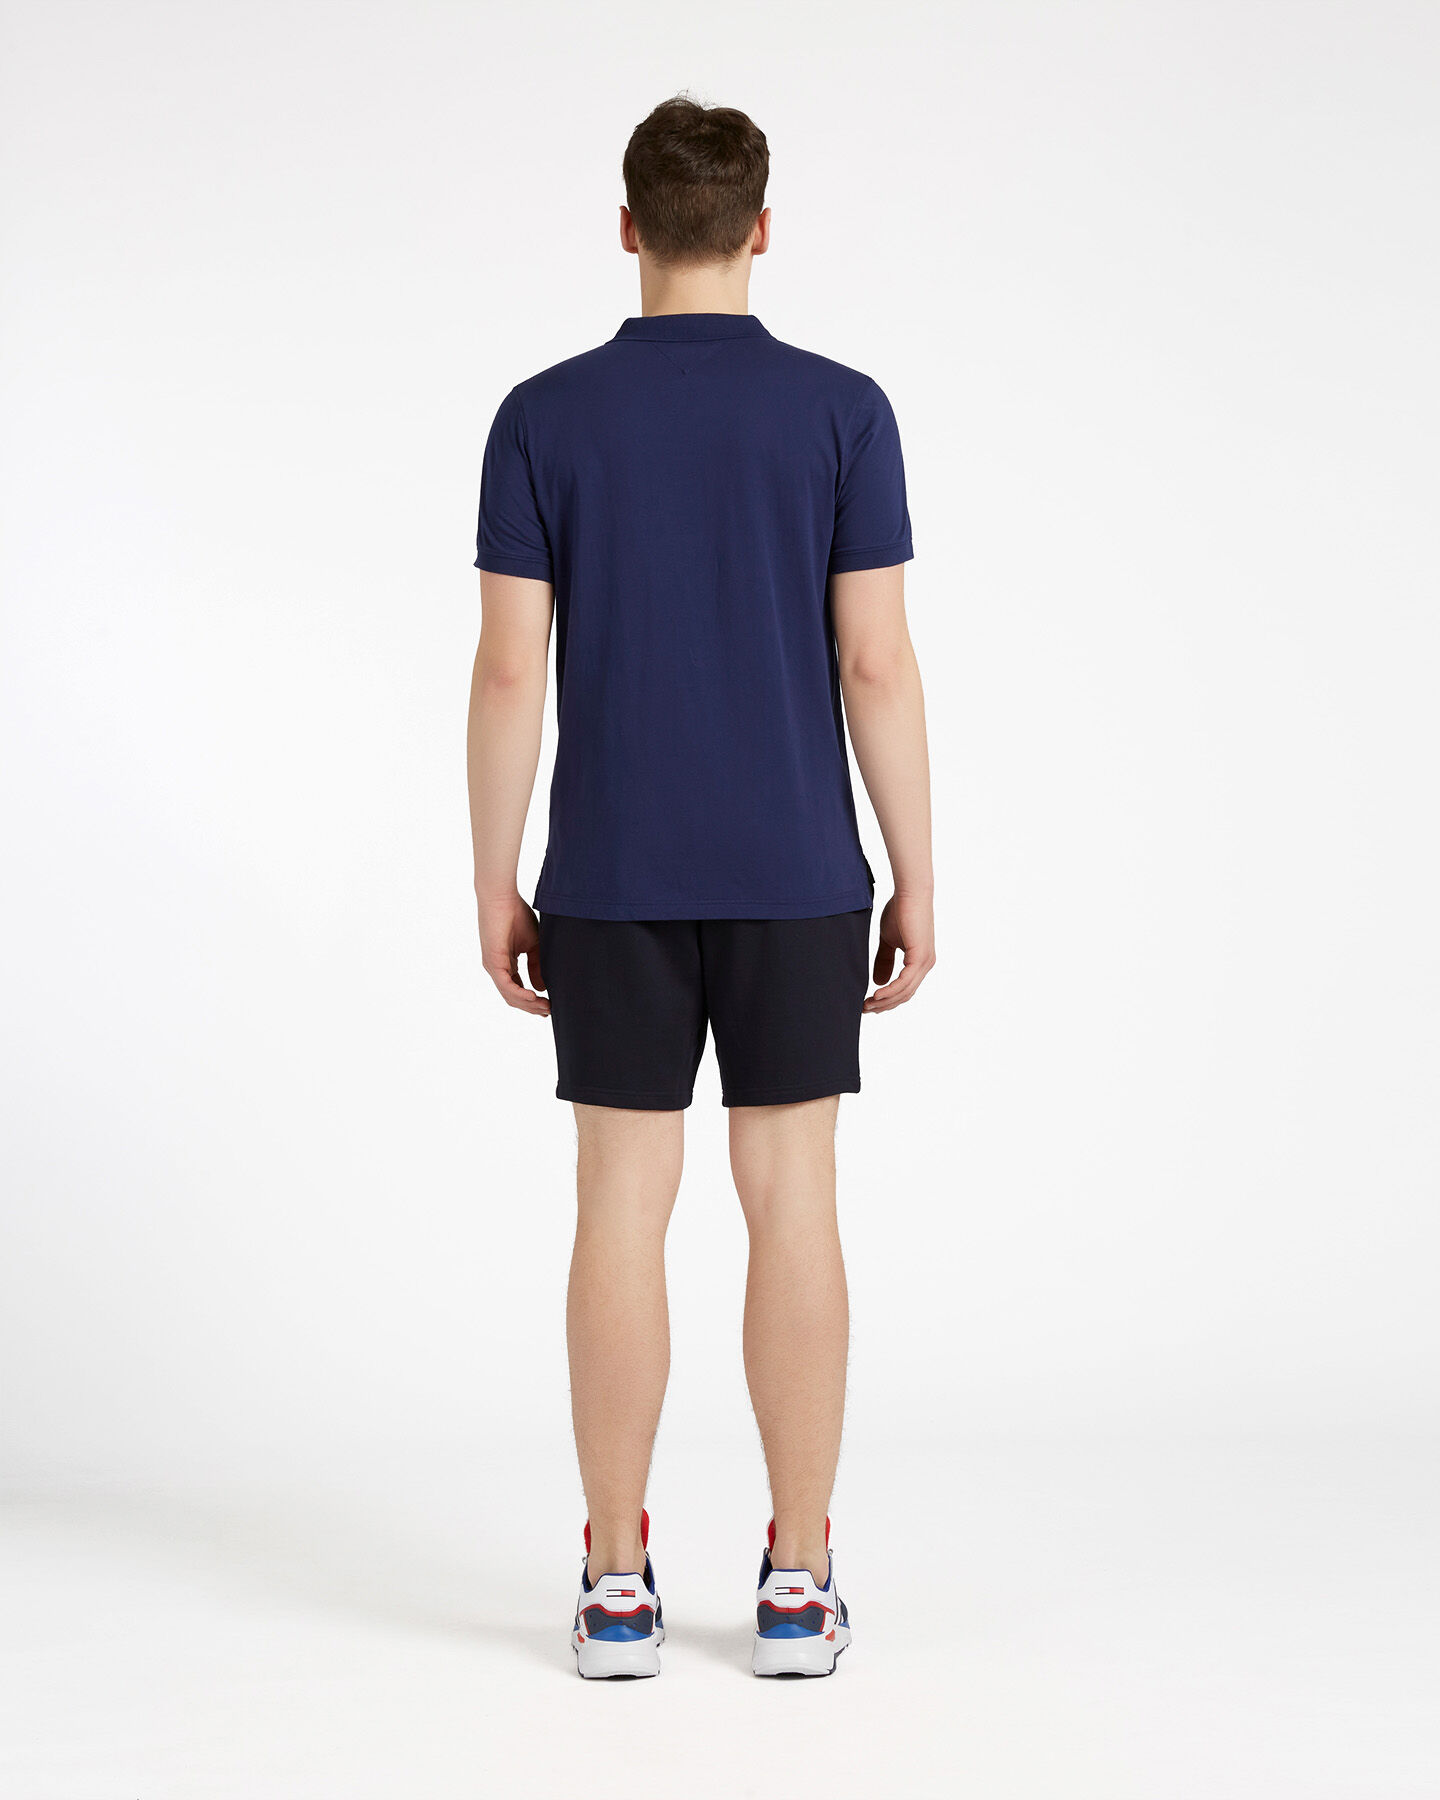 T-Shirt TOMMY HILFIGER CLEAN SLIM M S4089536 scatto 2